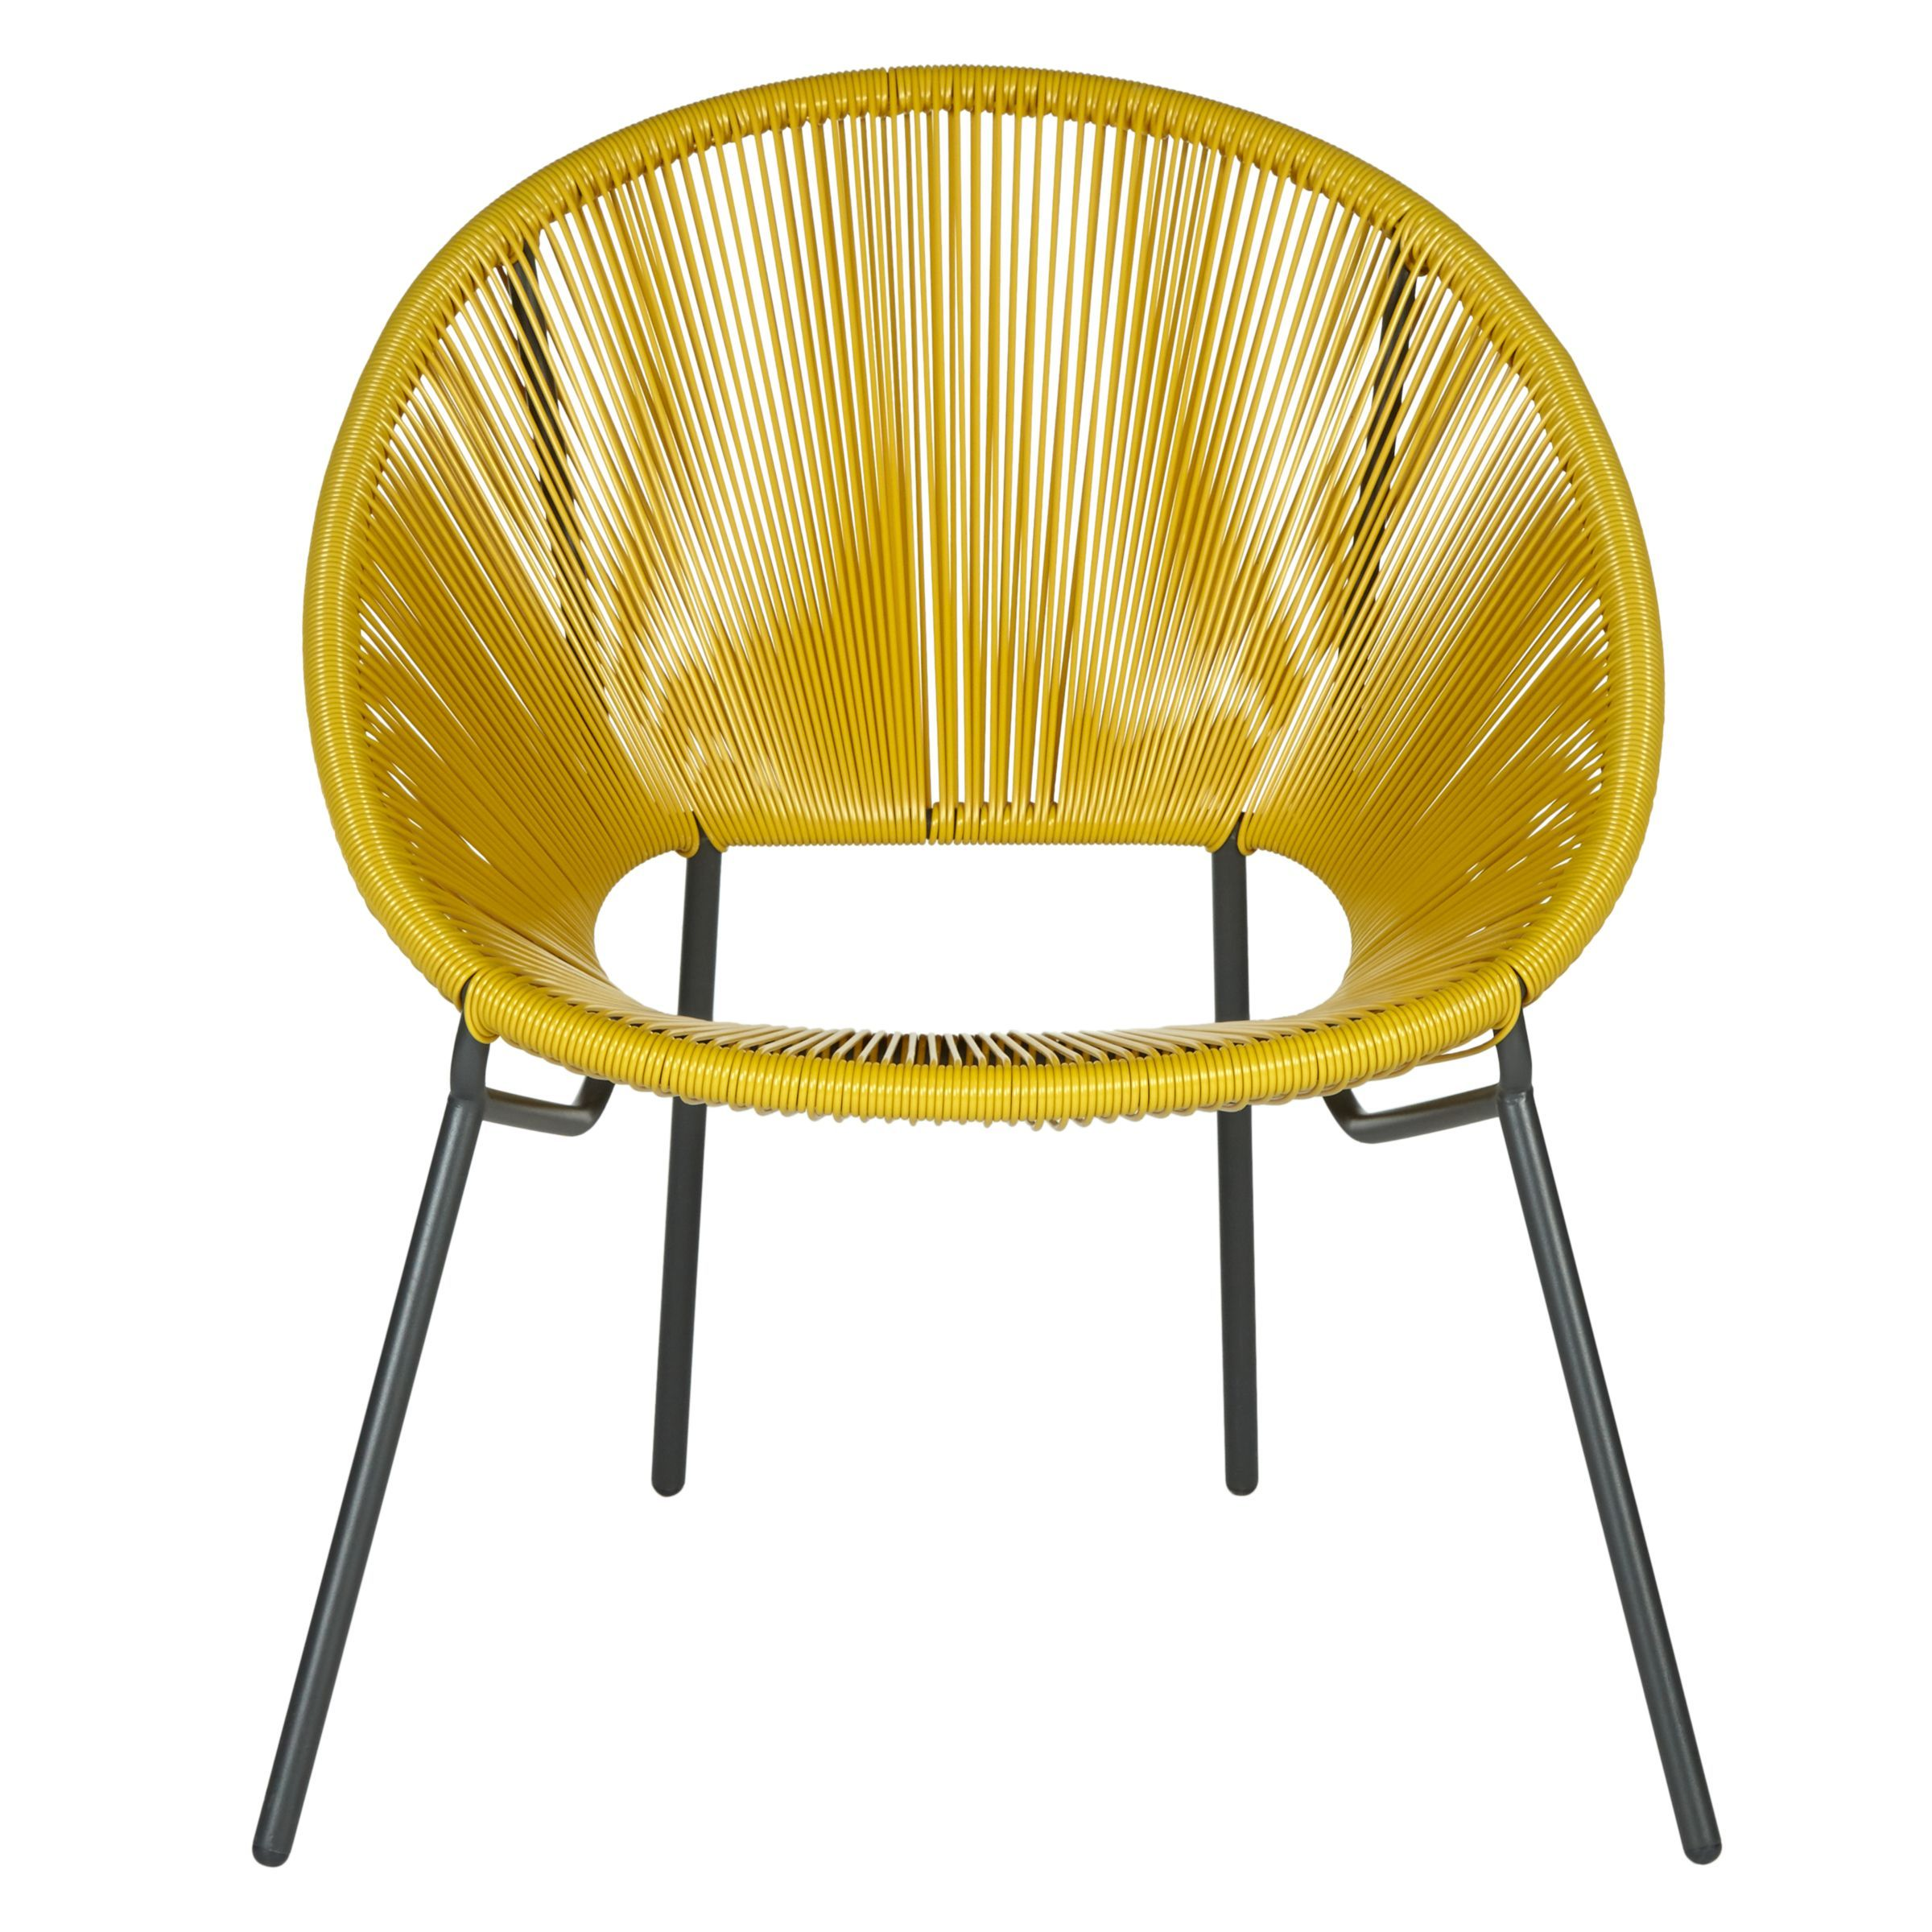 House By John Lewis Salsa Garden Chair Set Of 2 In 2020 Garden